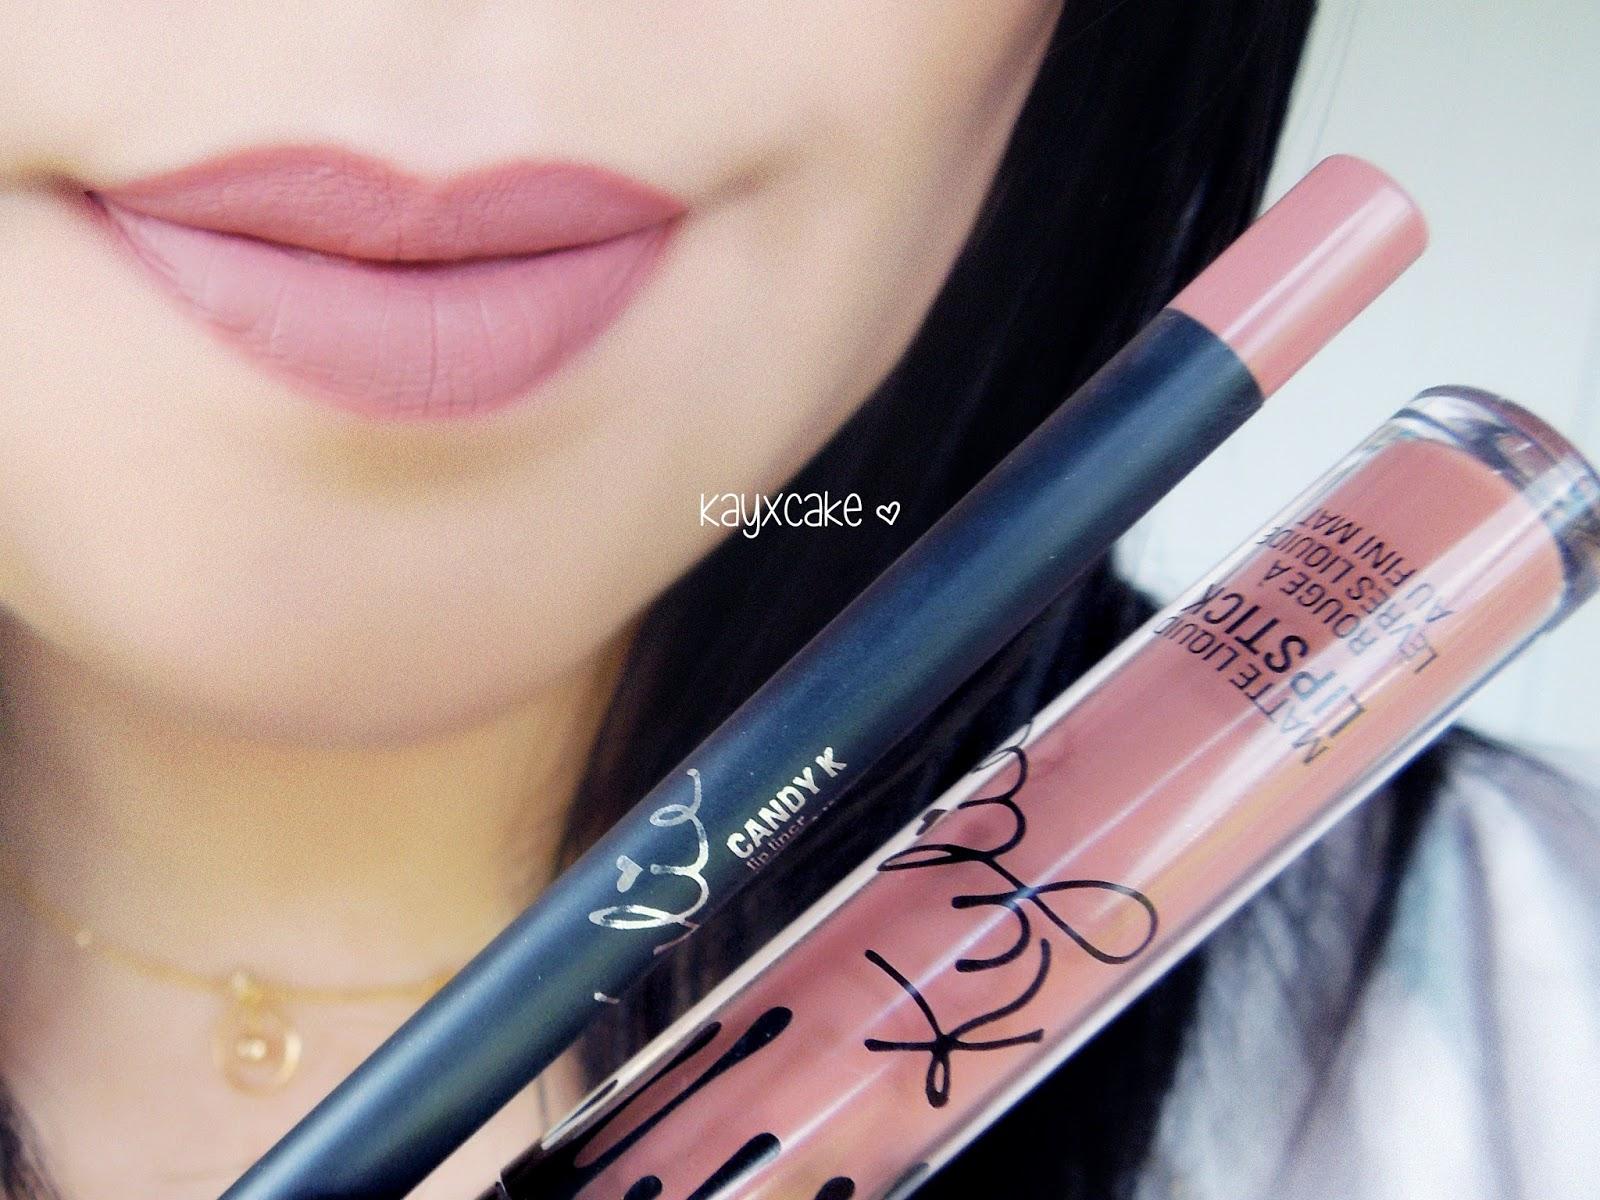 Kylie Lip Kits ♡ Koko K Candy K Dolce K Posie K